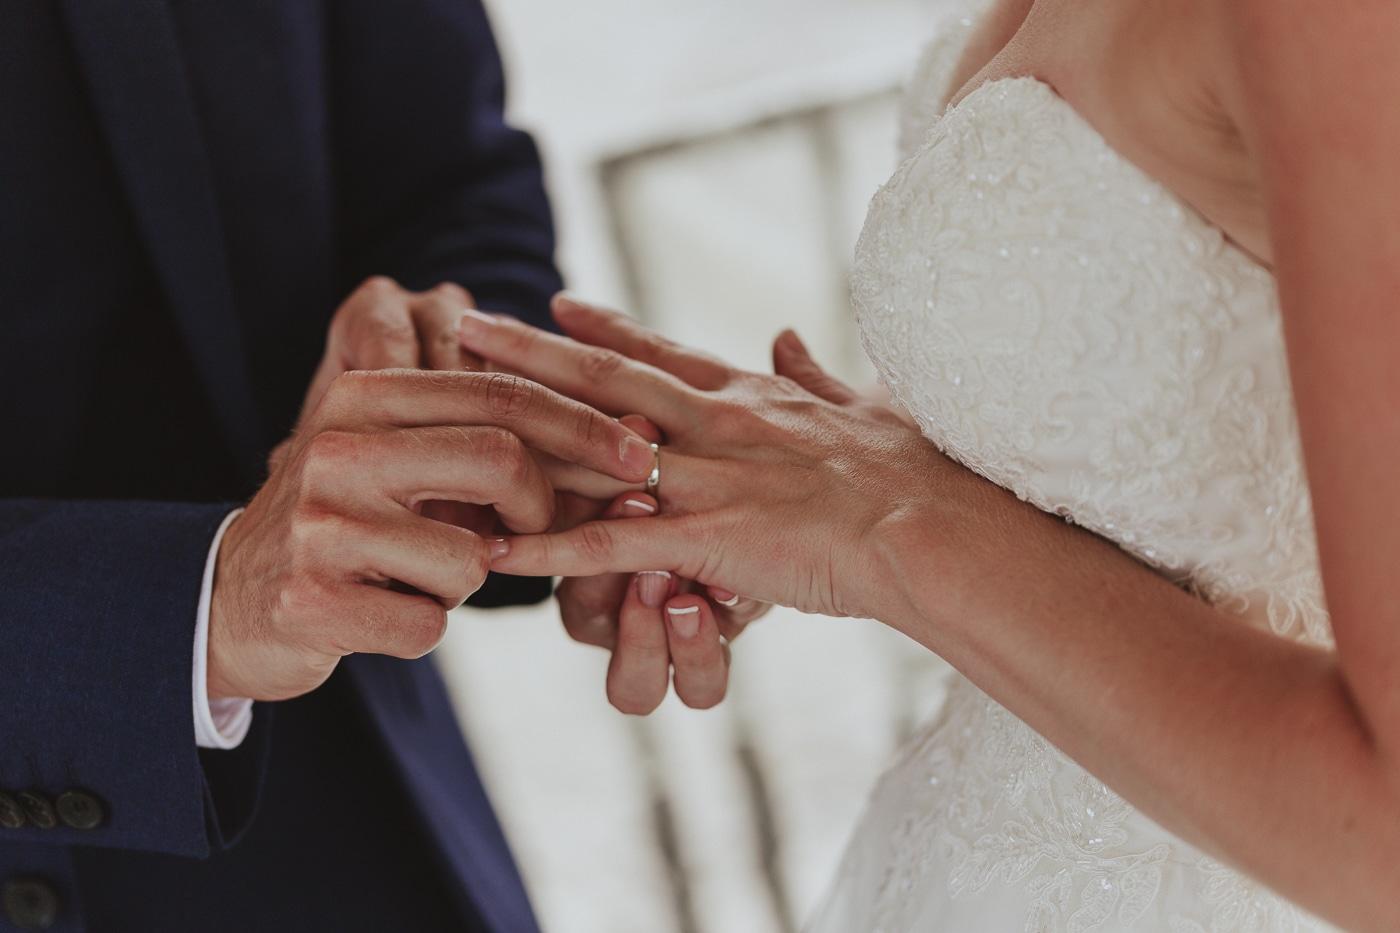 Groom putting white gold wedding ring on brides left ring finger